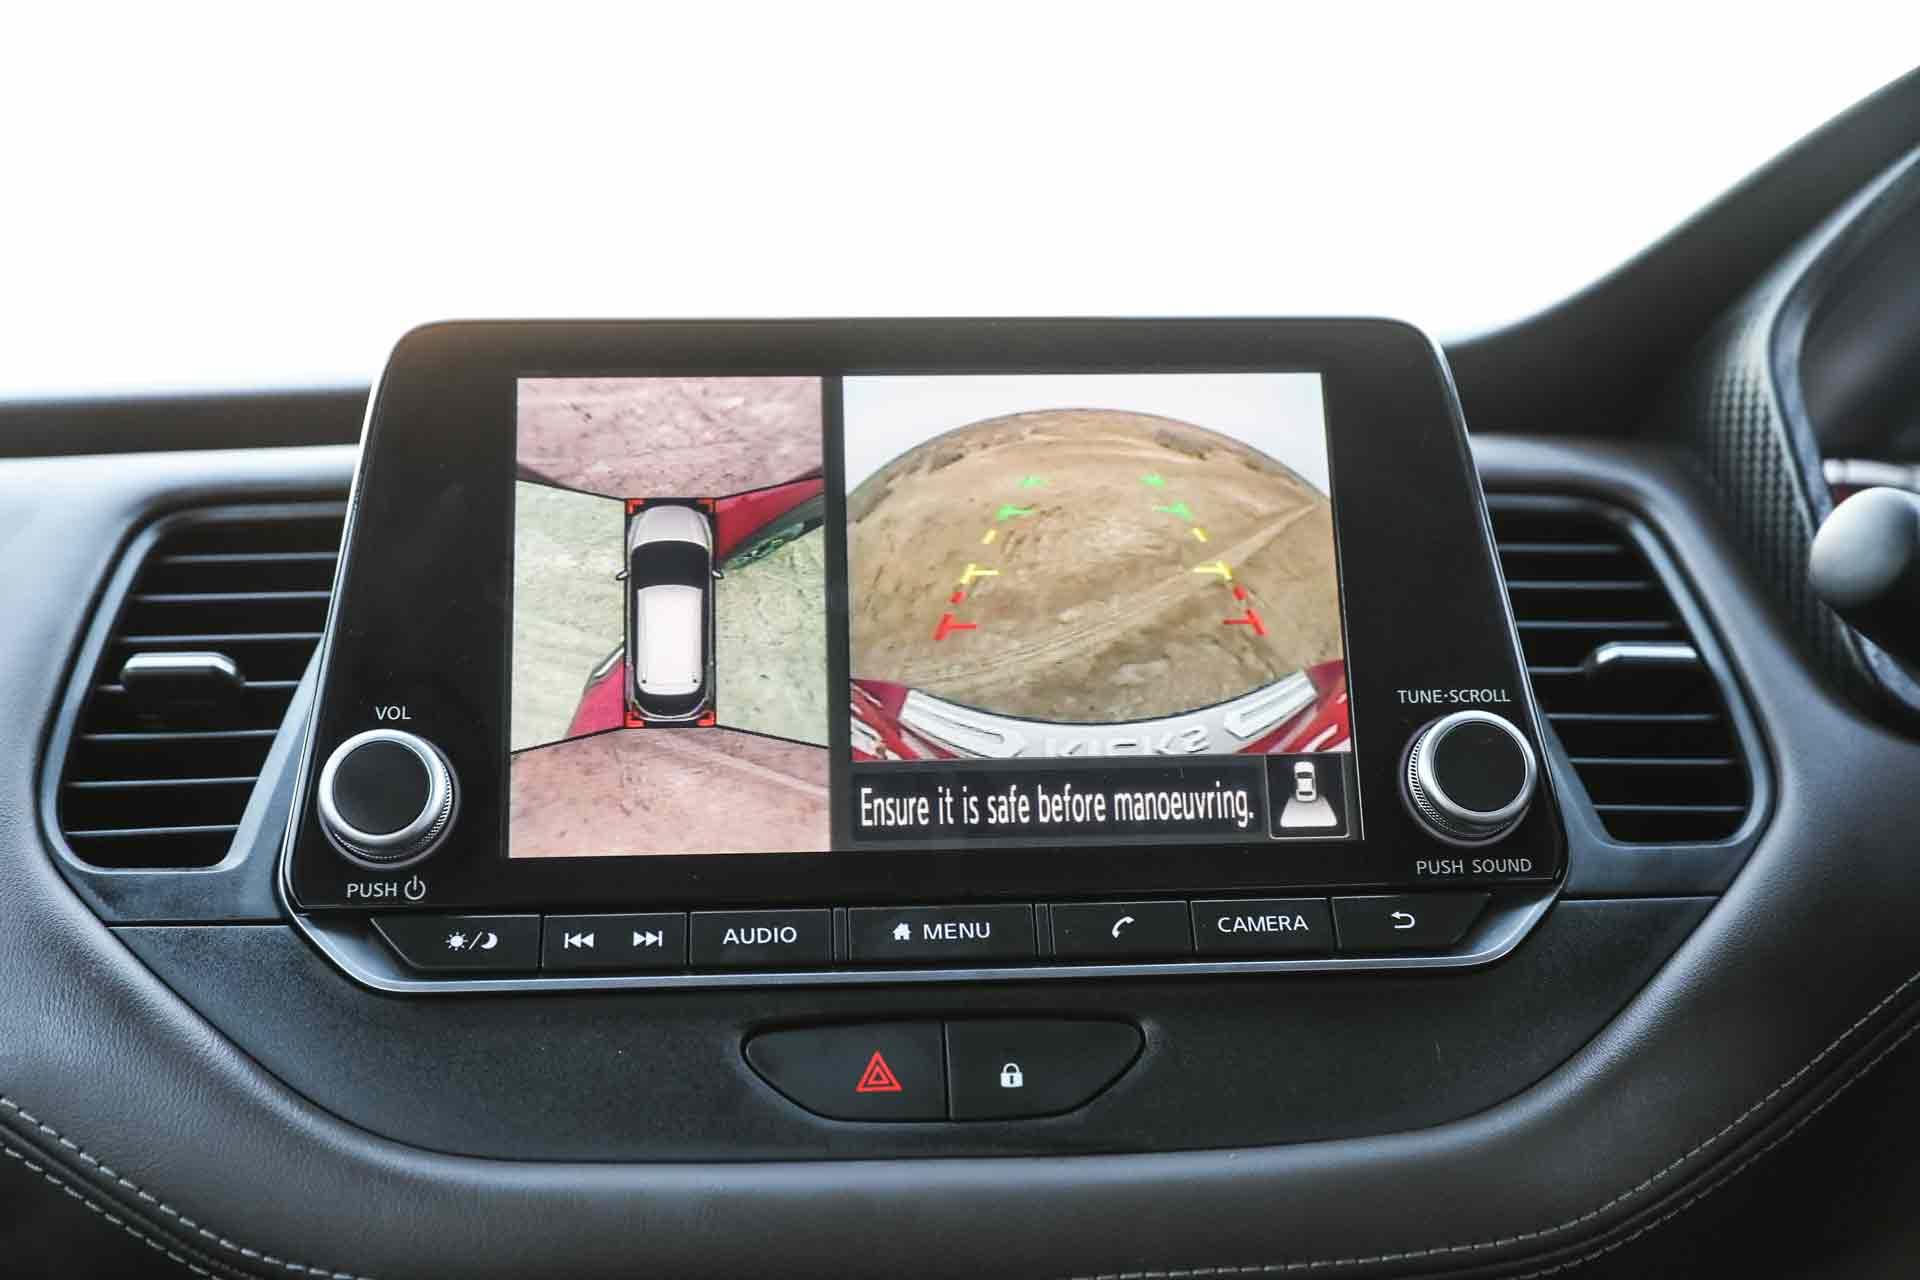 2019 Nissan Kicks Infotainment 360 Camera